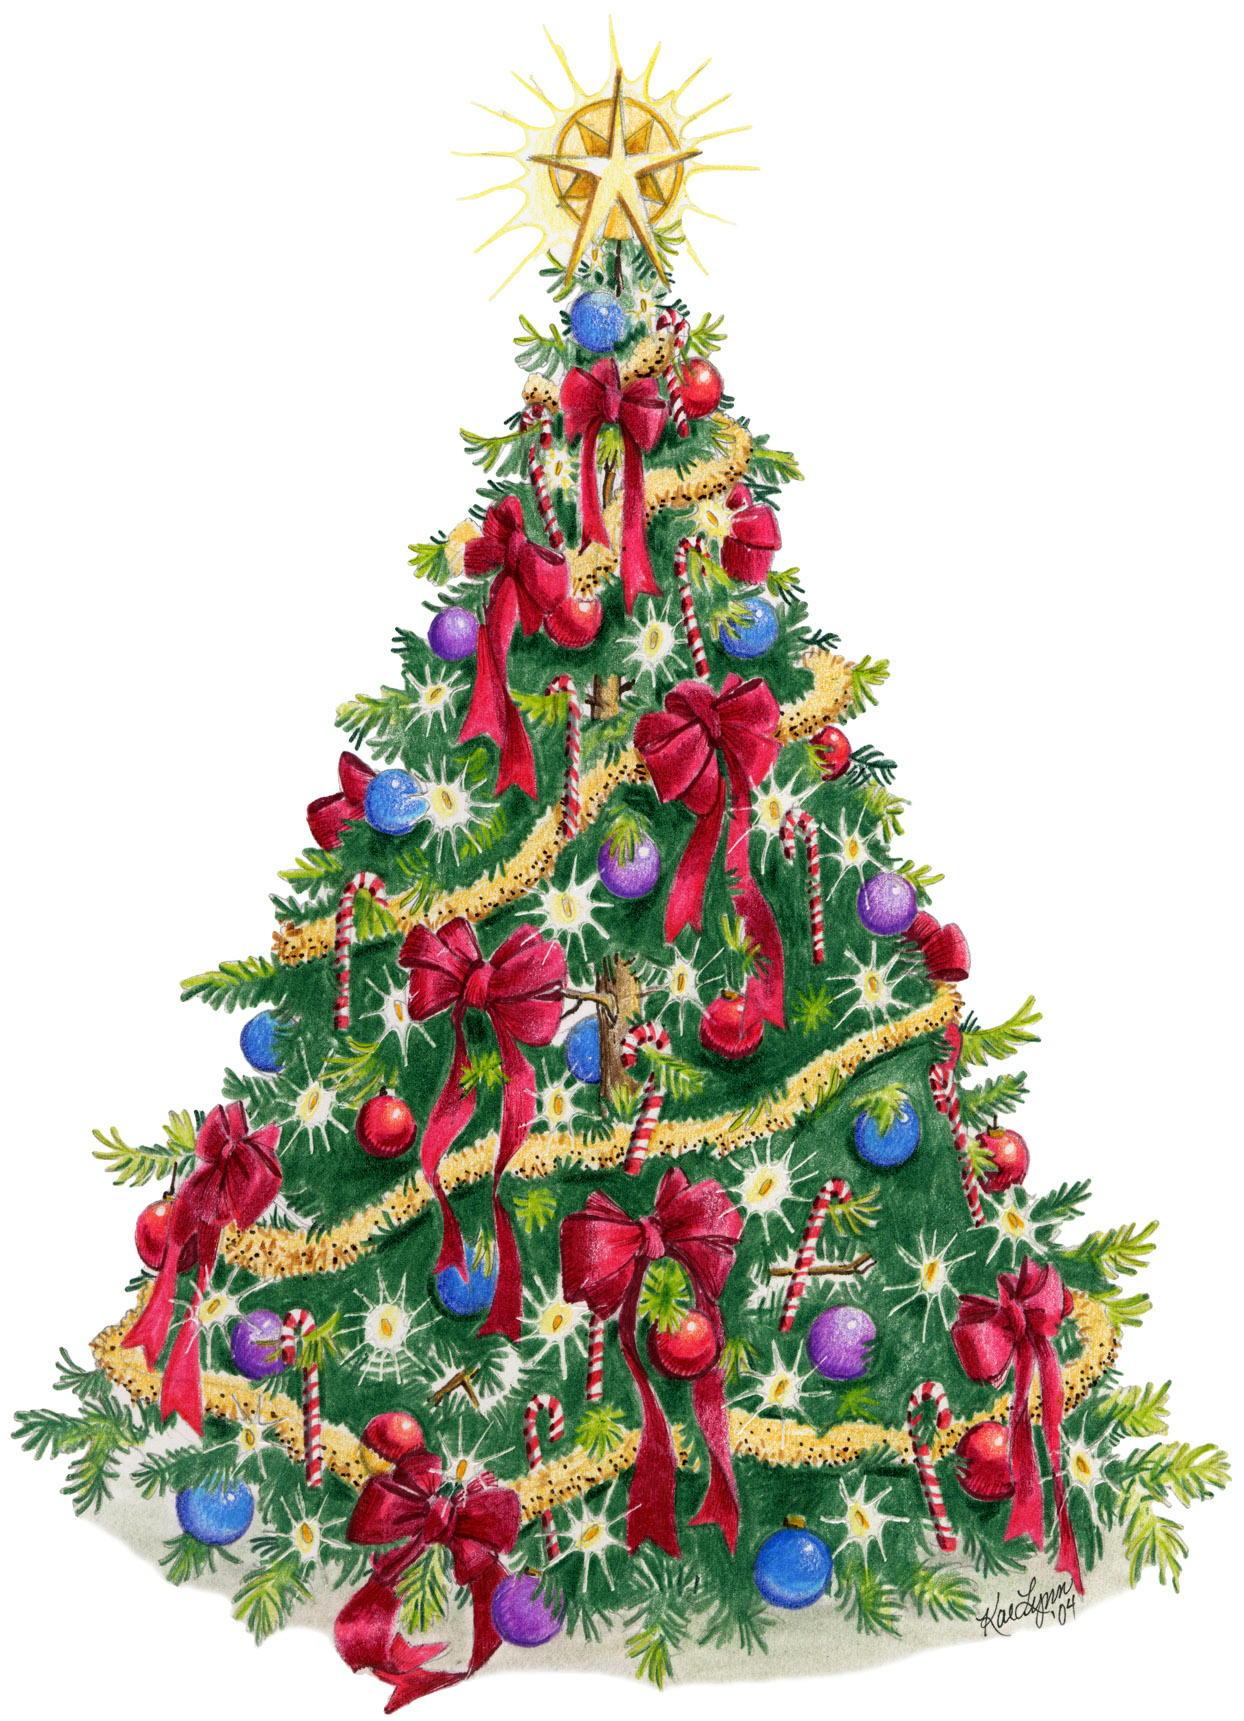 Christmas Tree Wallpaper 5180 - HDWPro